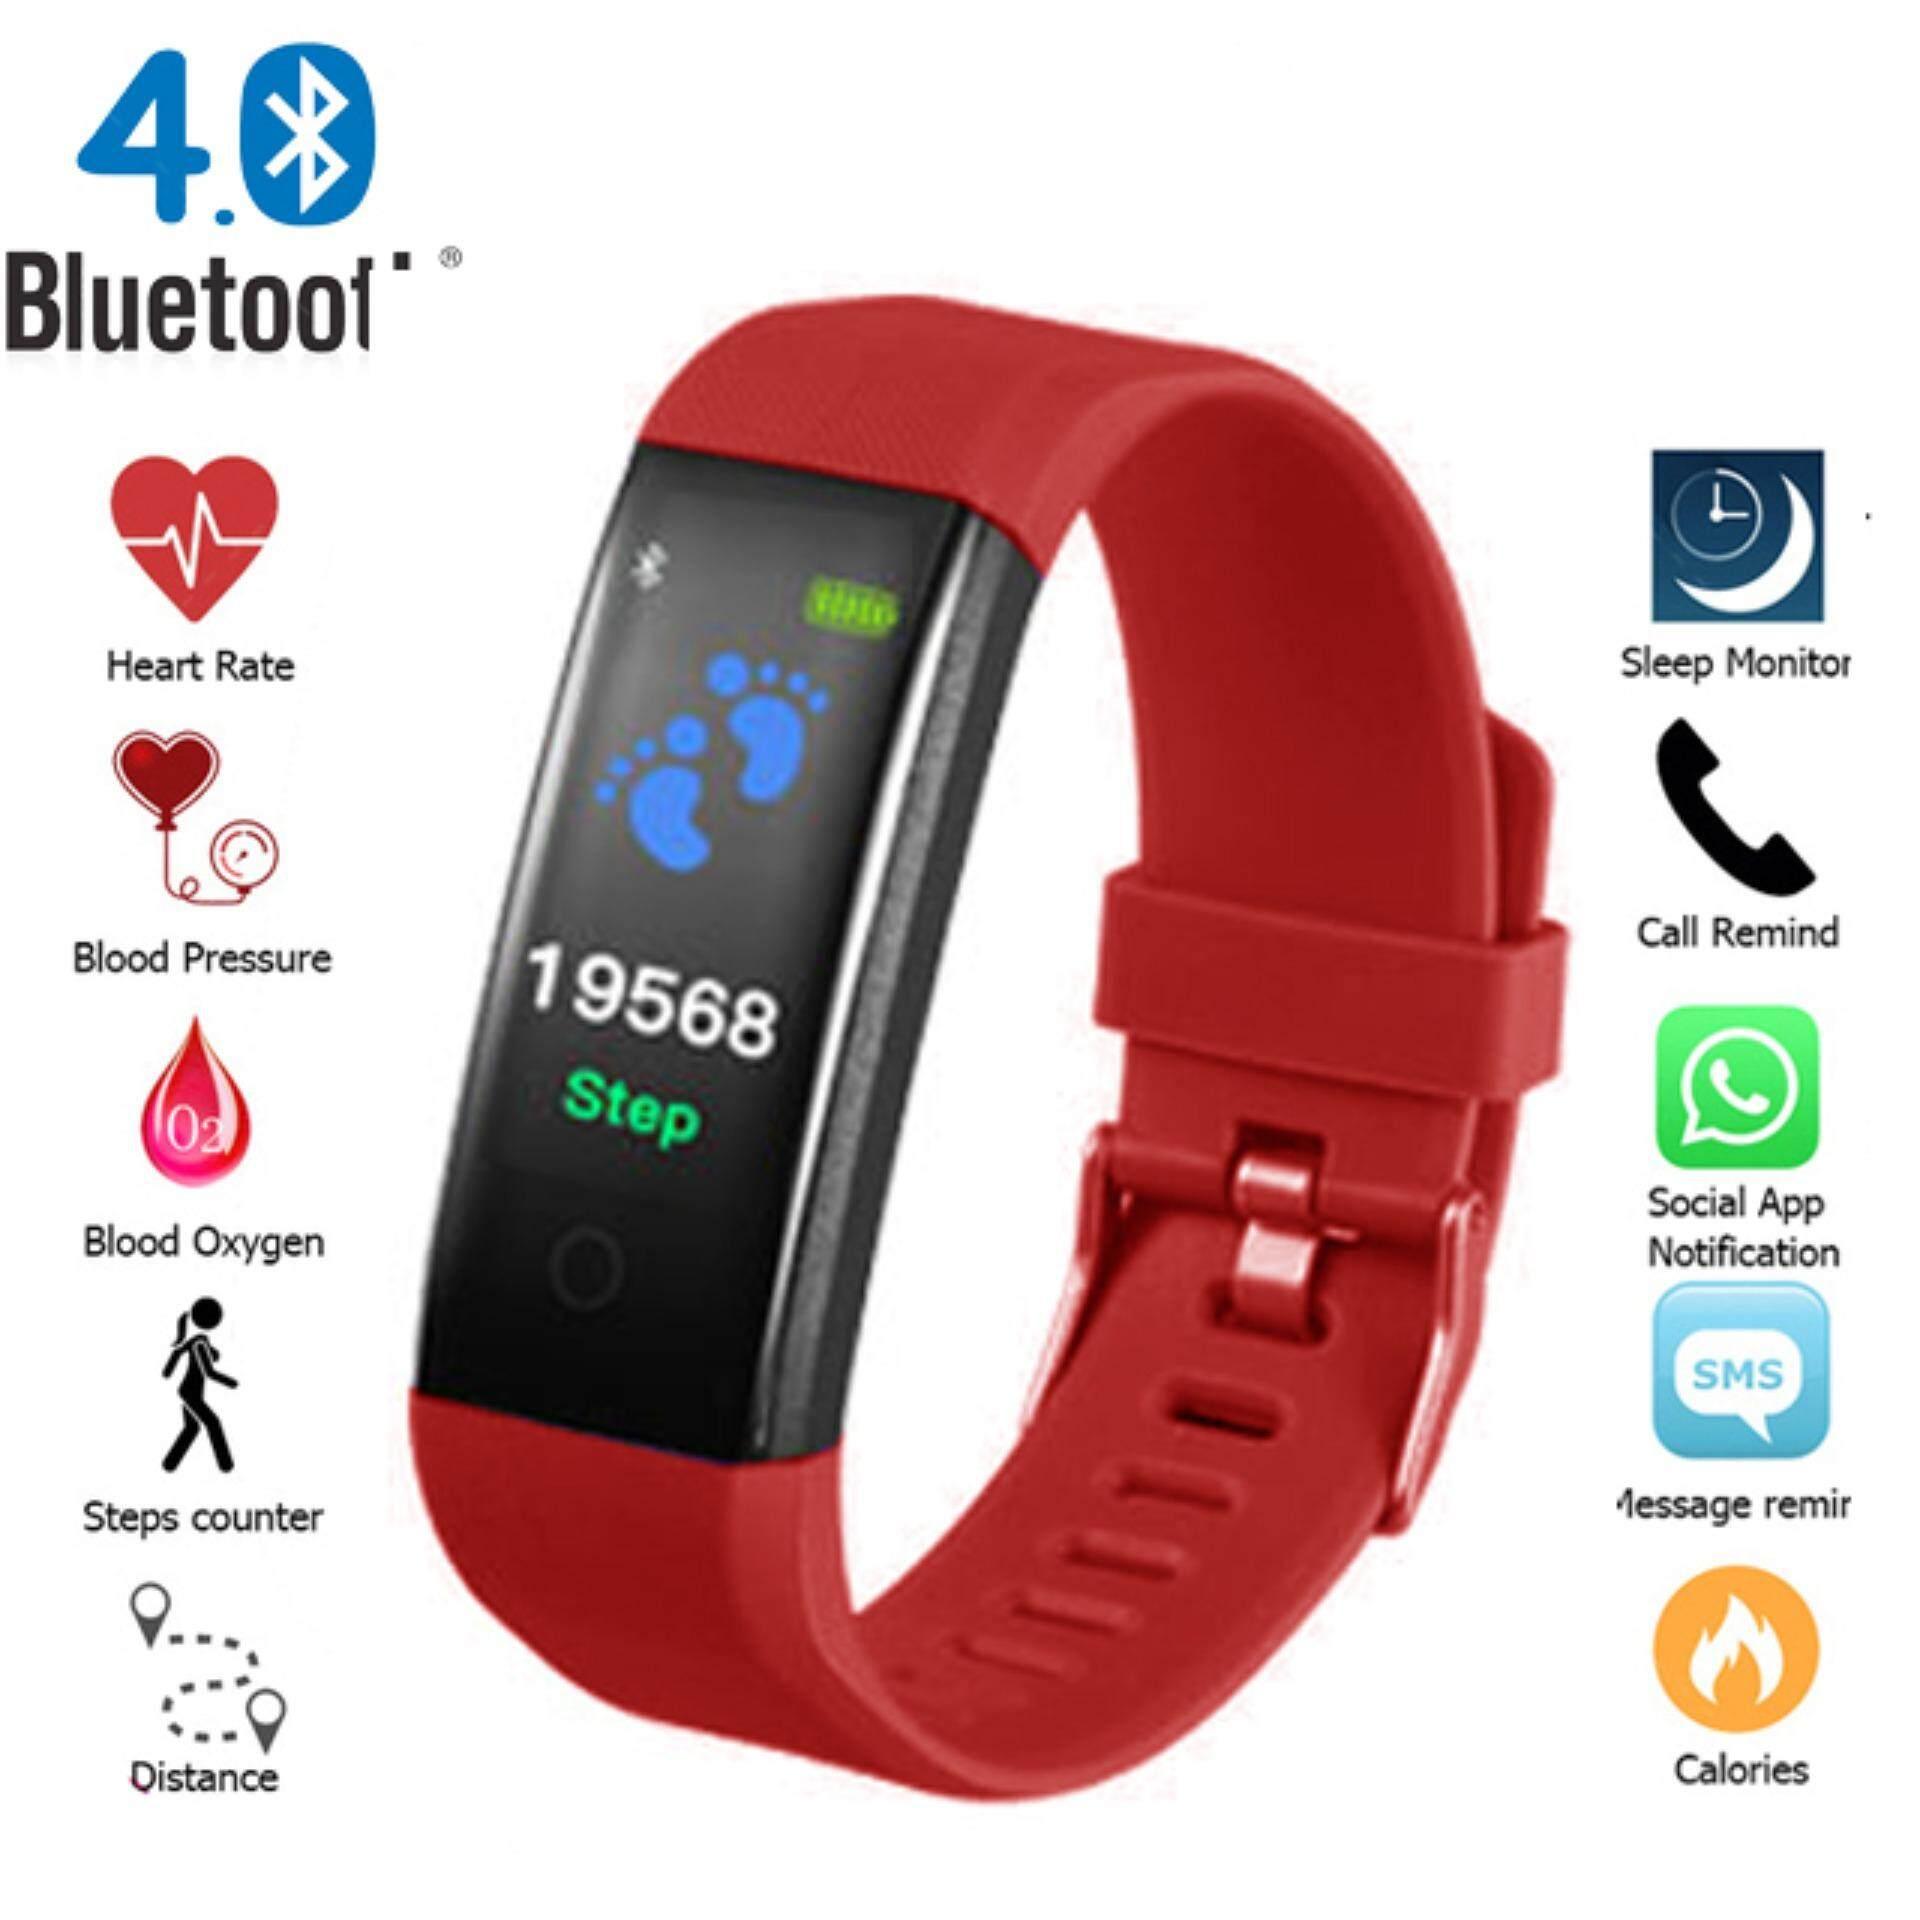 Zazzy Dolls นาฬิกาข้อมือ Smart Watch หน้าจอสี นับก้าวเดิน วัดอัตราการเต้นของหัวใจ วัดแคลอรี่ แจ้งเตือนสายเรียกเข้า เชื่อมต่อผ่าน Bluetooth รุ่น Zd-0164.